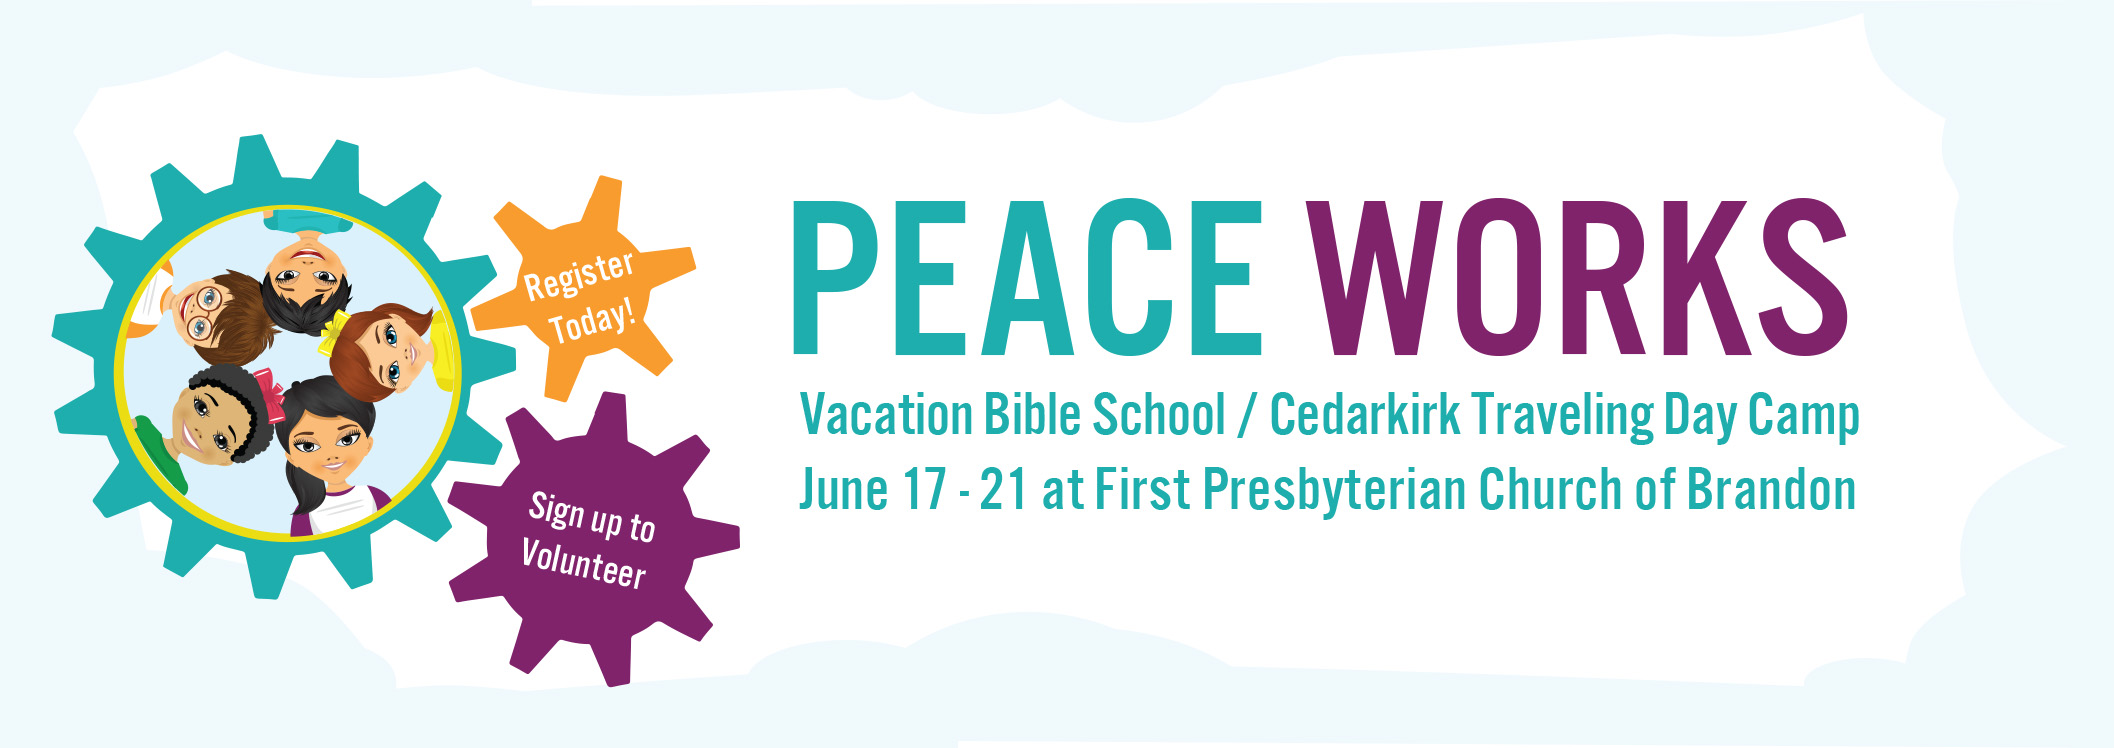 Vacation Bible School 2019 at First Presbyterian Church of Brandon